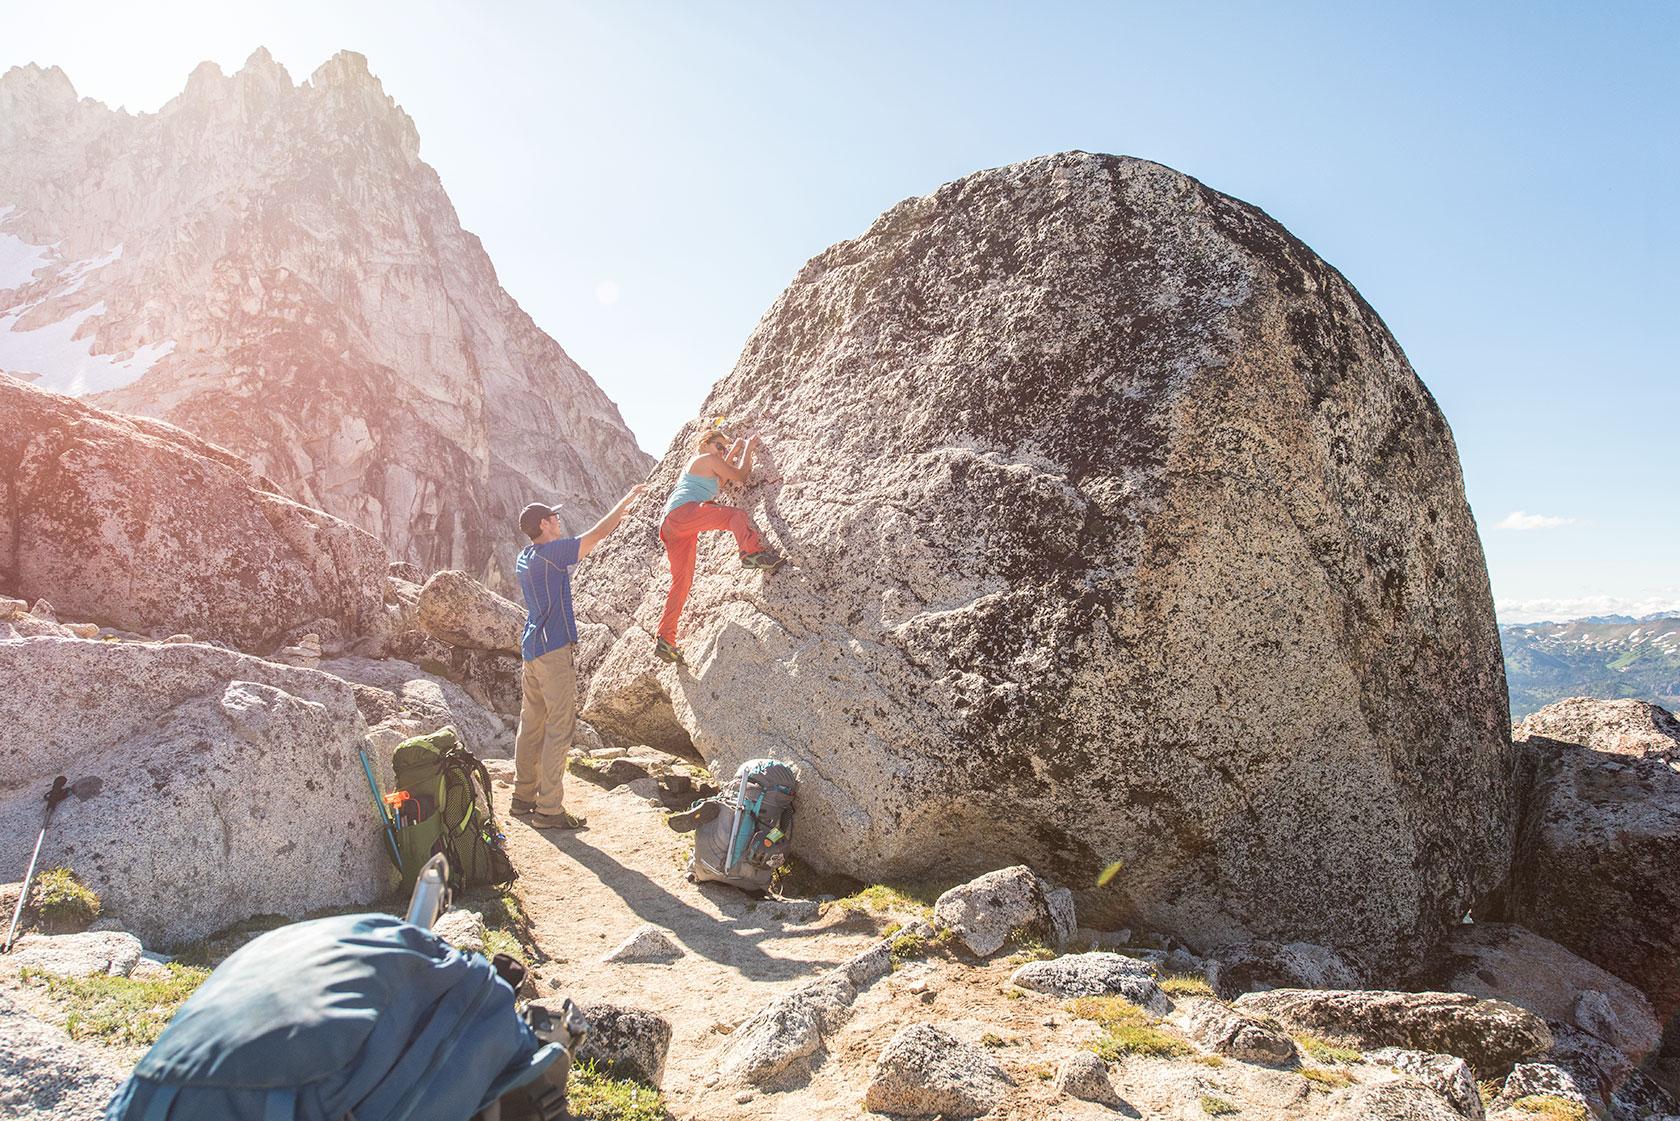 austin-trigg-osprey-hiking-backpacks-rock-climbing-hike-camp-washington-adventure-product-lifestyle-outdoor-enchantments.jpg